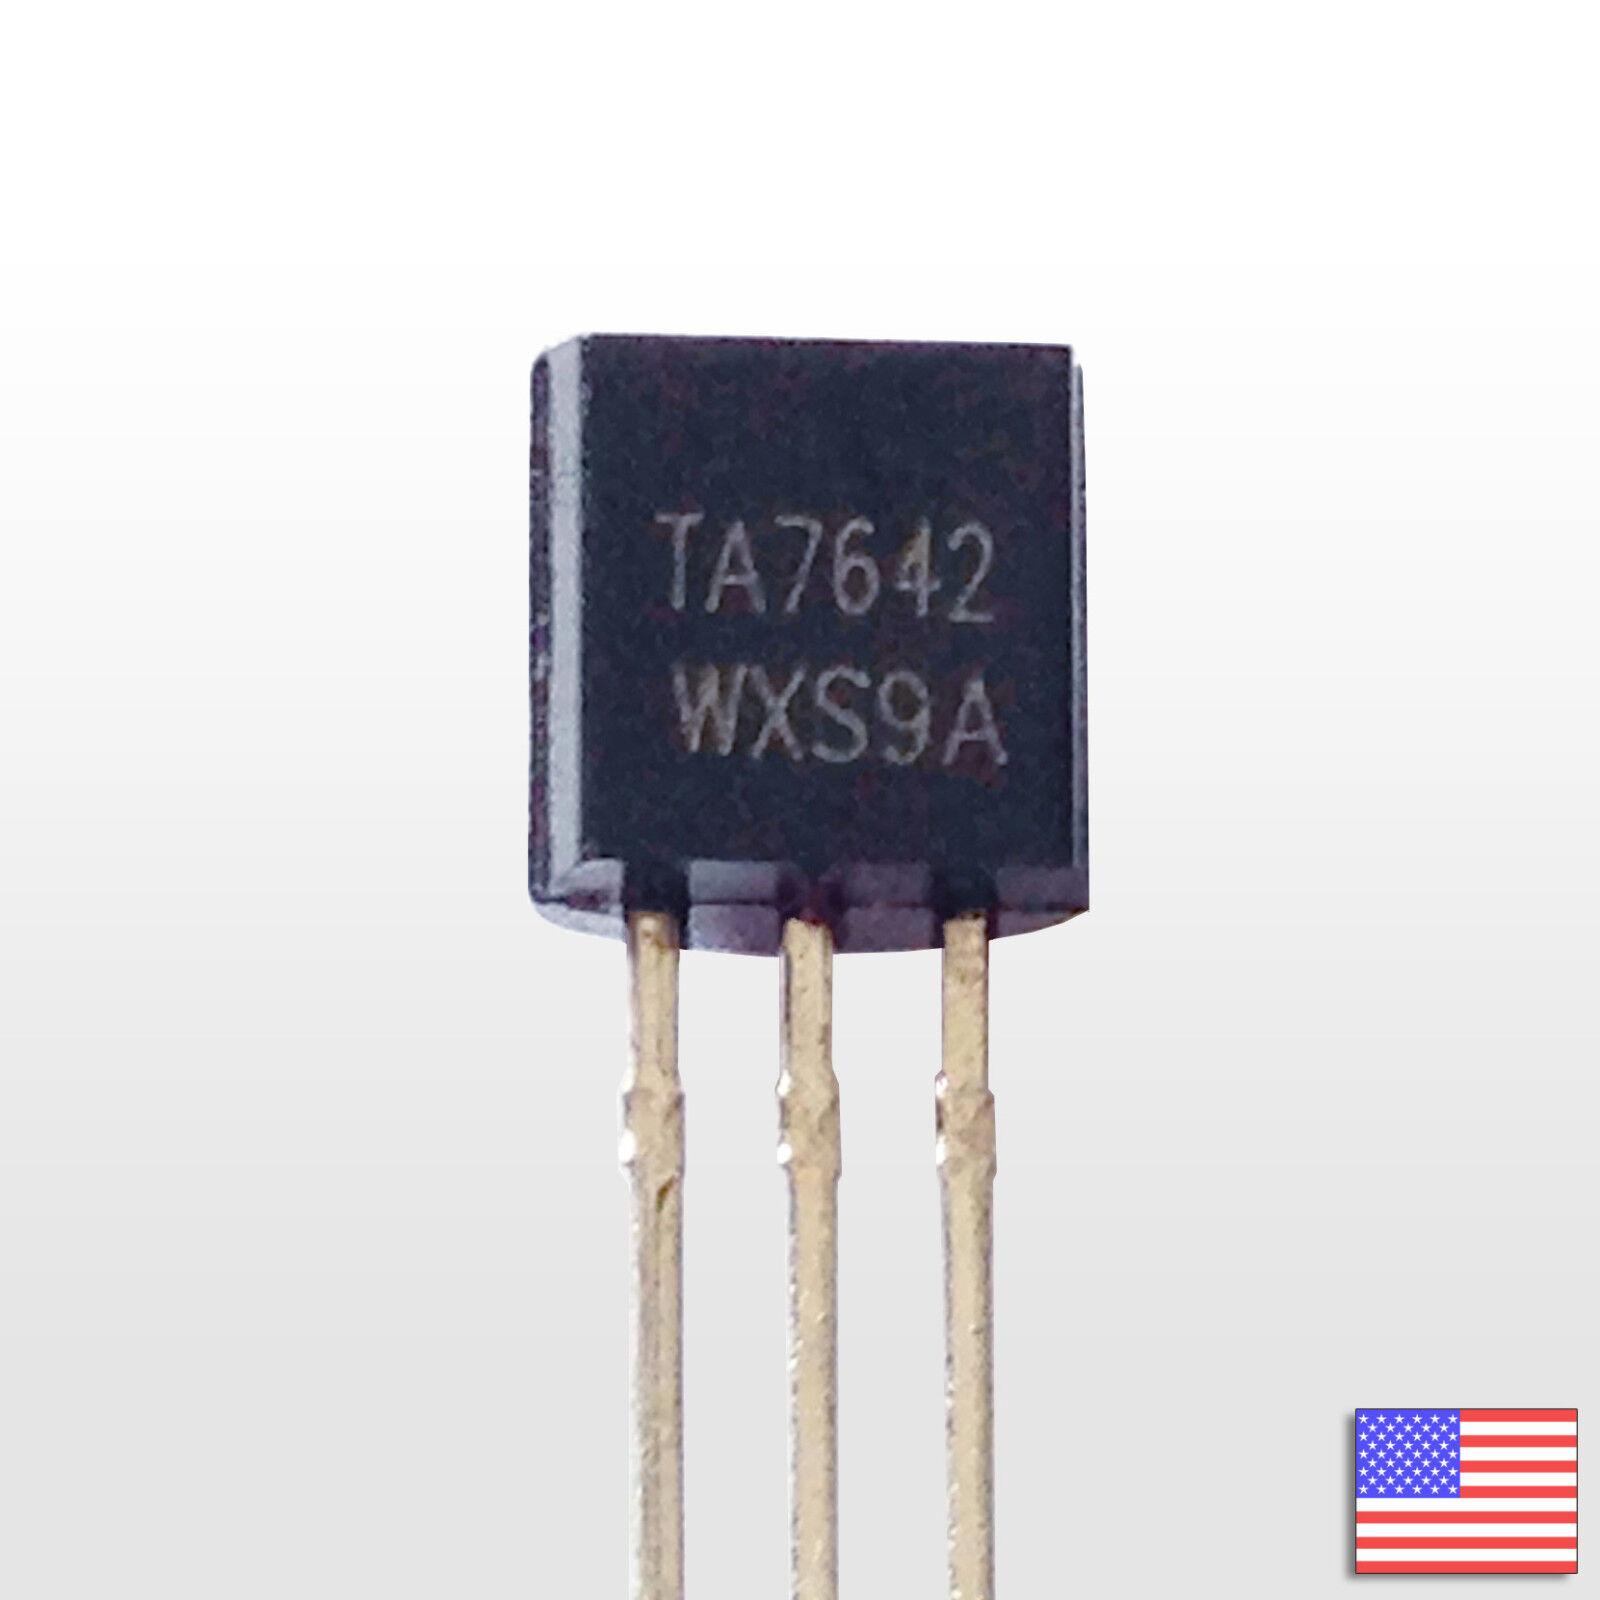 200PCS TA7642 Nuevo y Original Único Chip AM Radio TO-92 IC